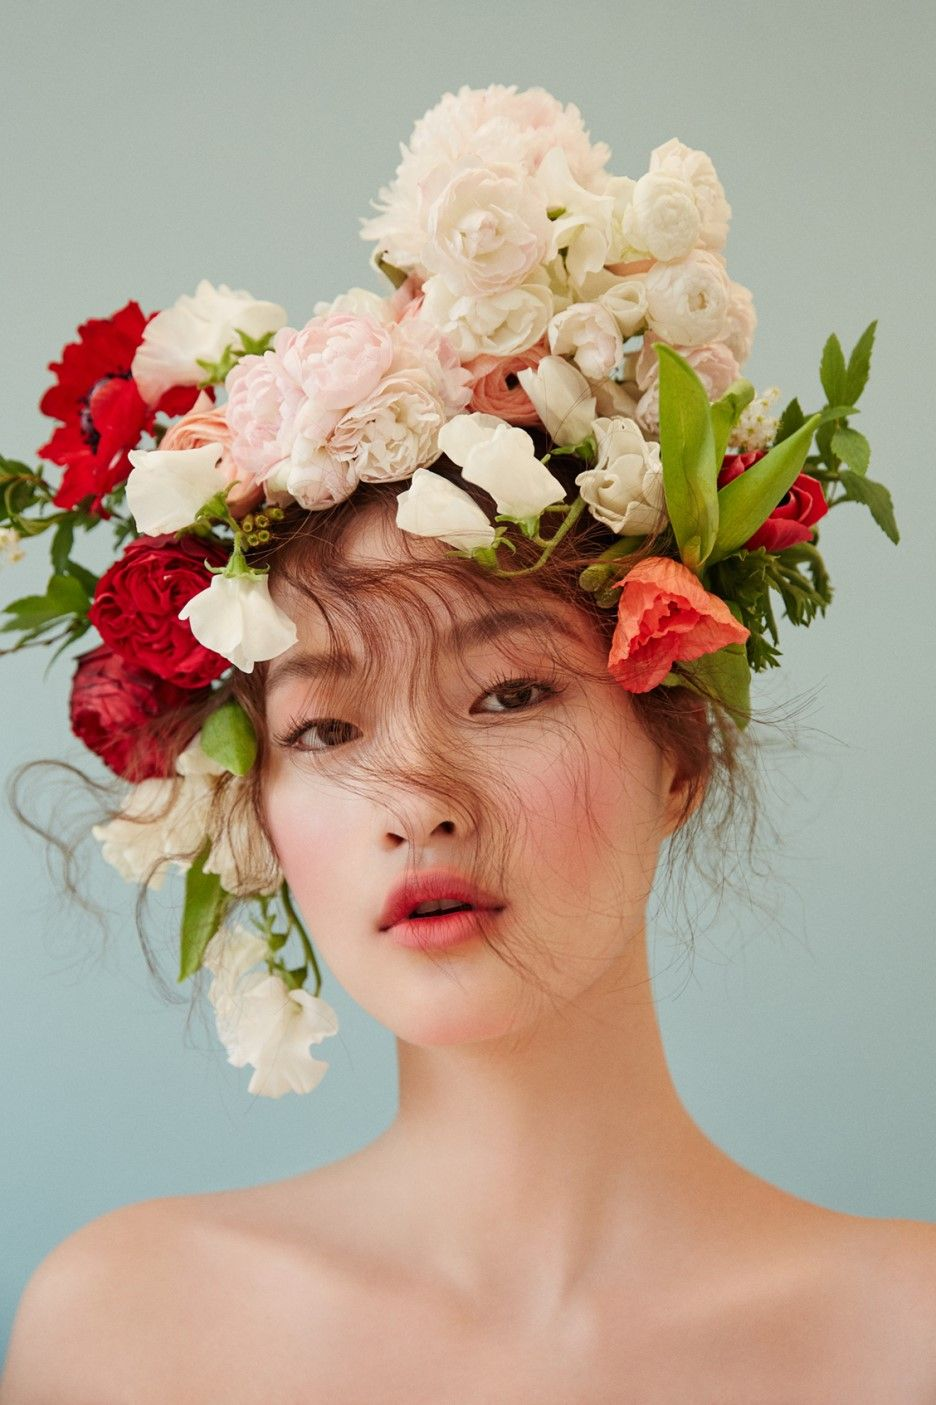 Seo Yoo Jin by Shin Seon Hye for Singles Korea Apr 2017